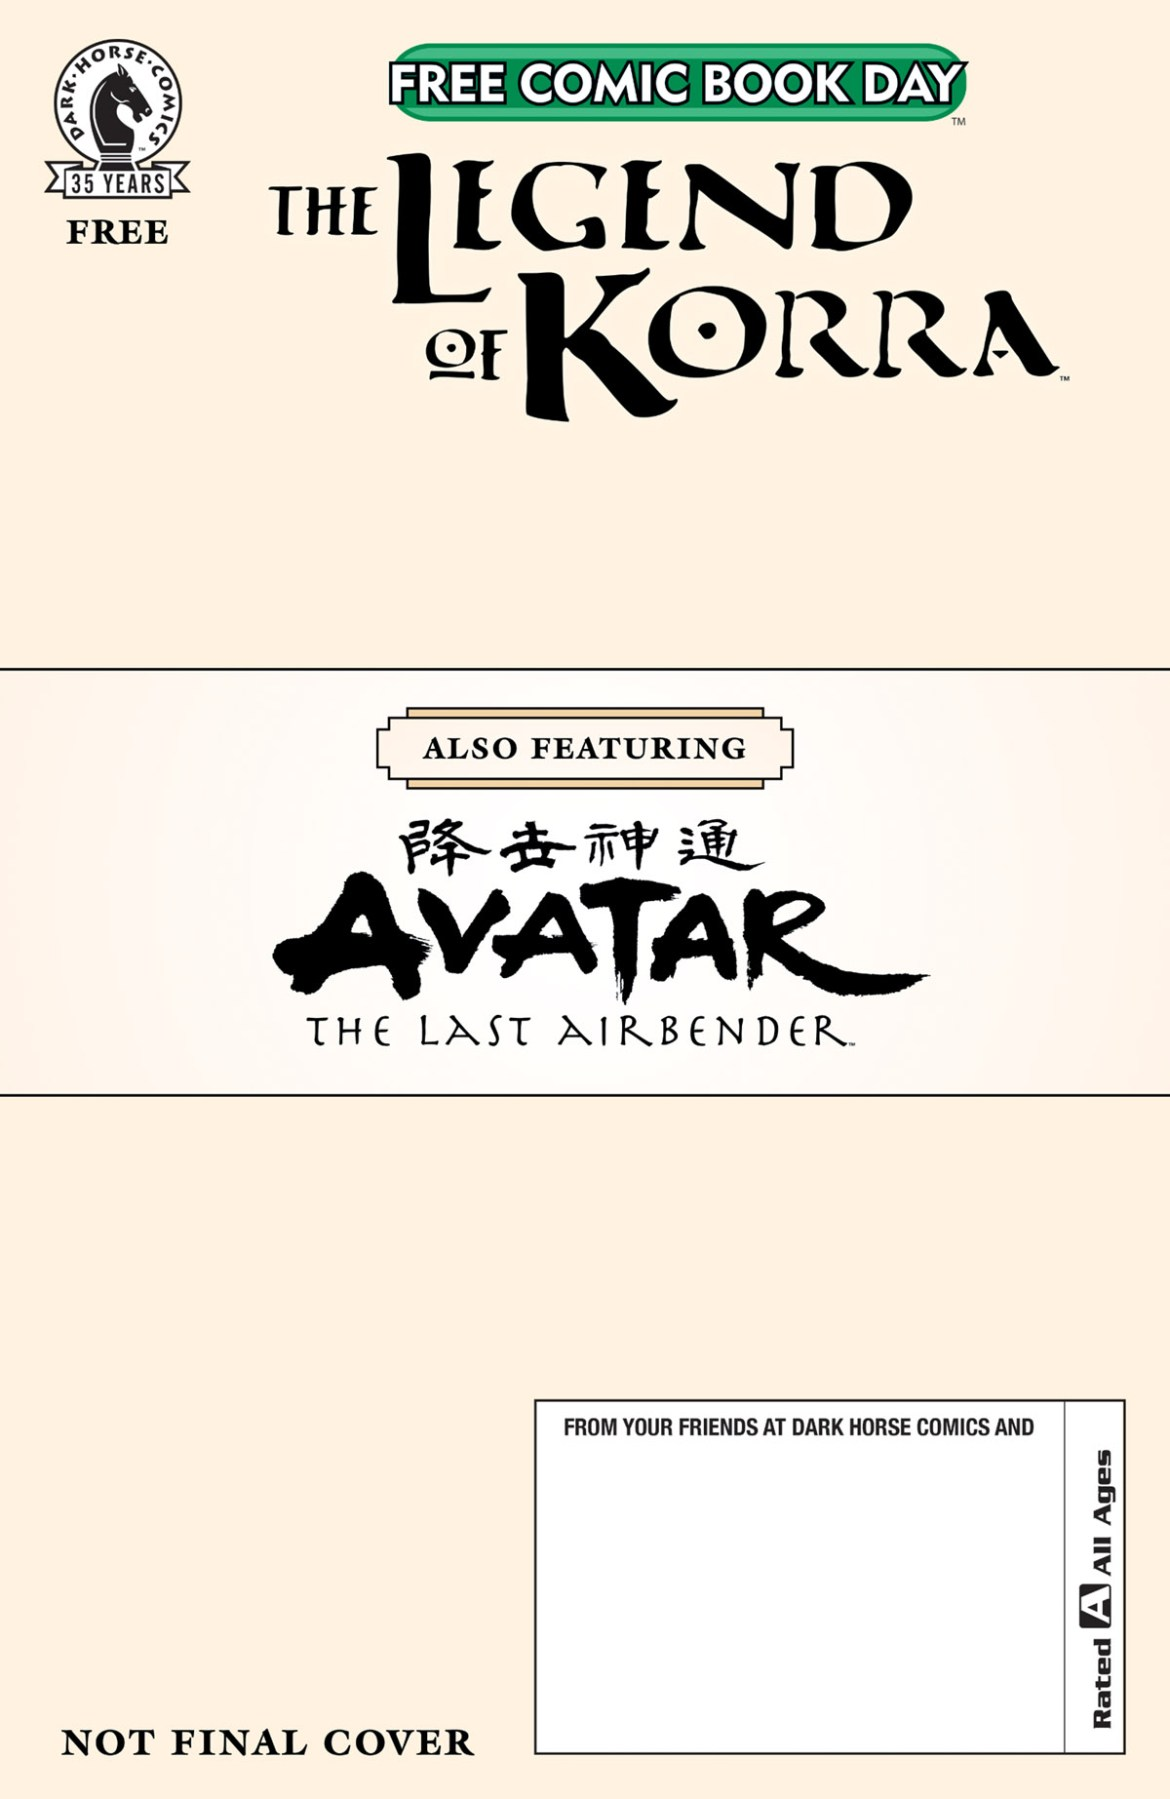 FCBD21_SILVER_Dark-Horse_Korra-–-Avatar-Abend Complete Free Comic Book Day 2021 comic book line-up announced